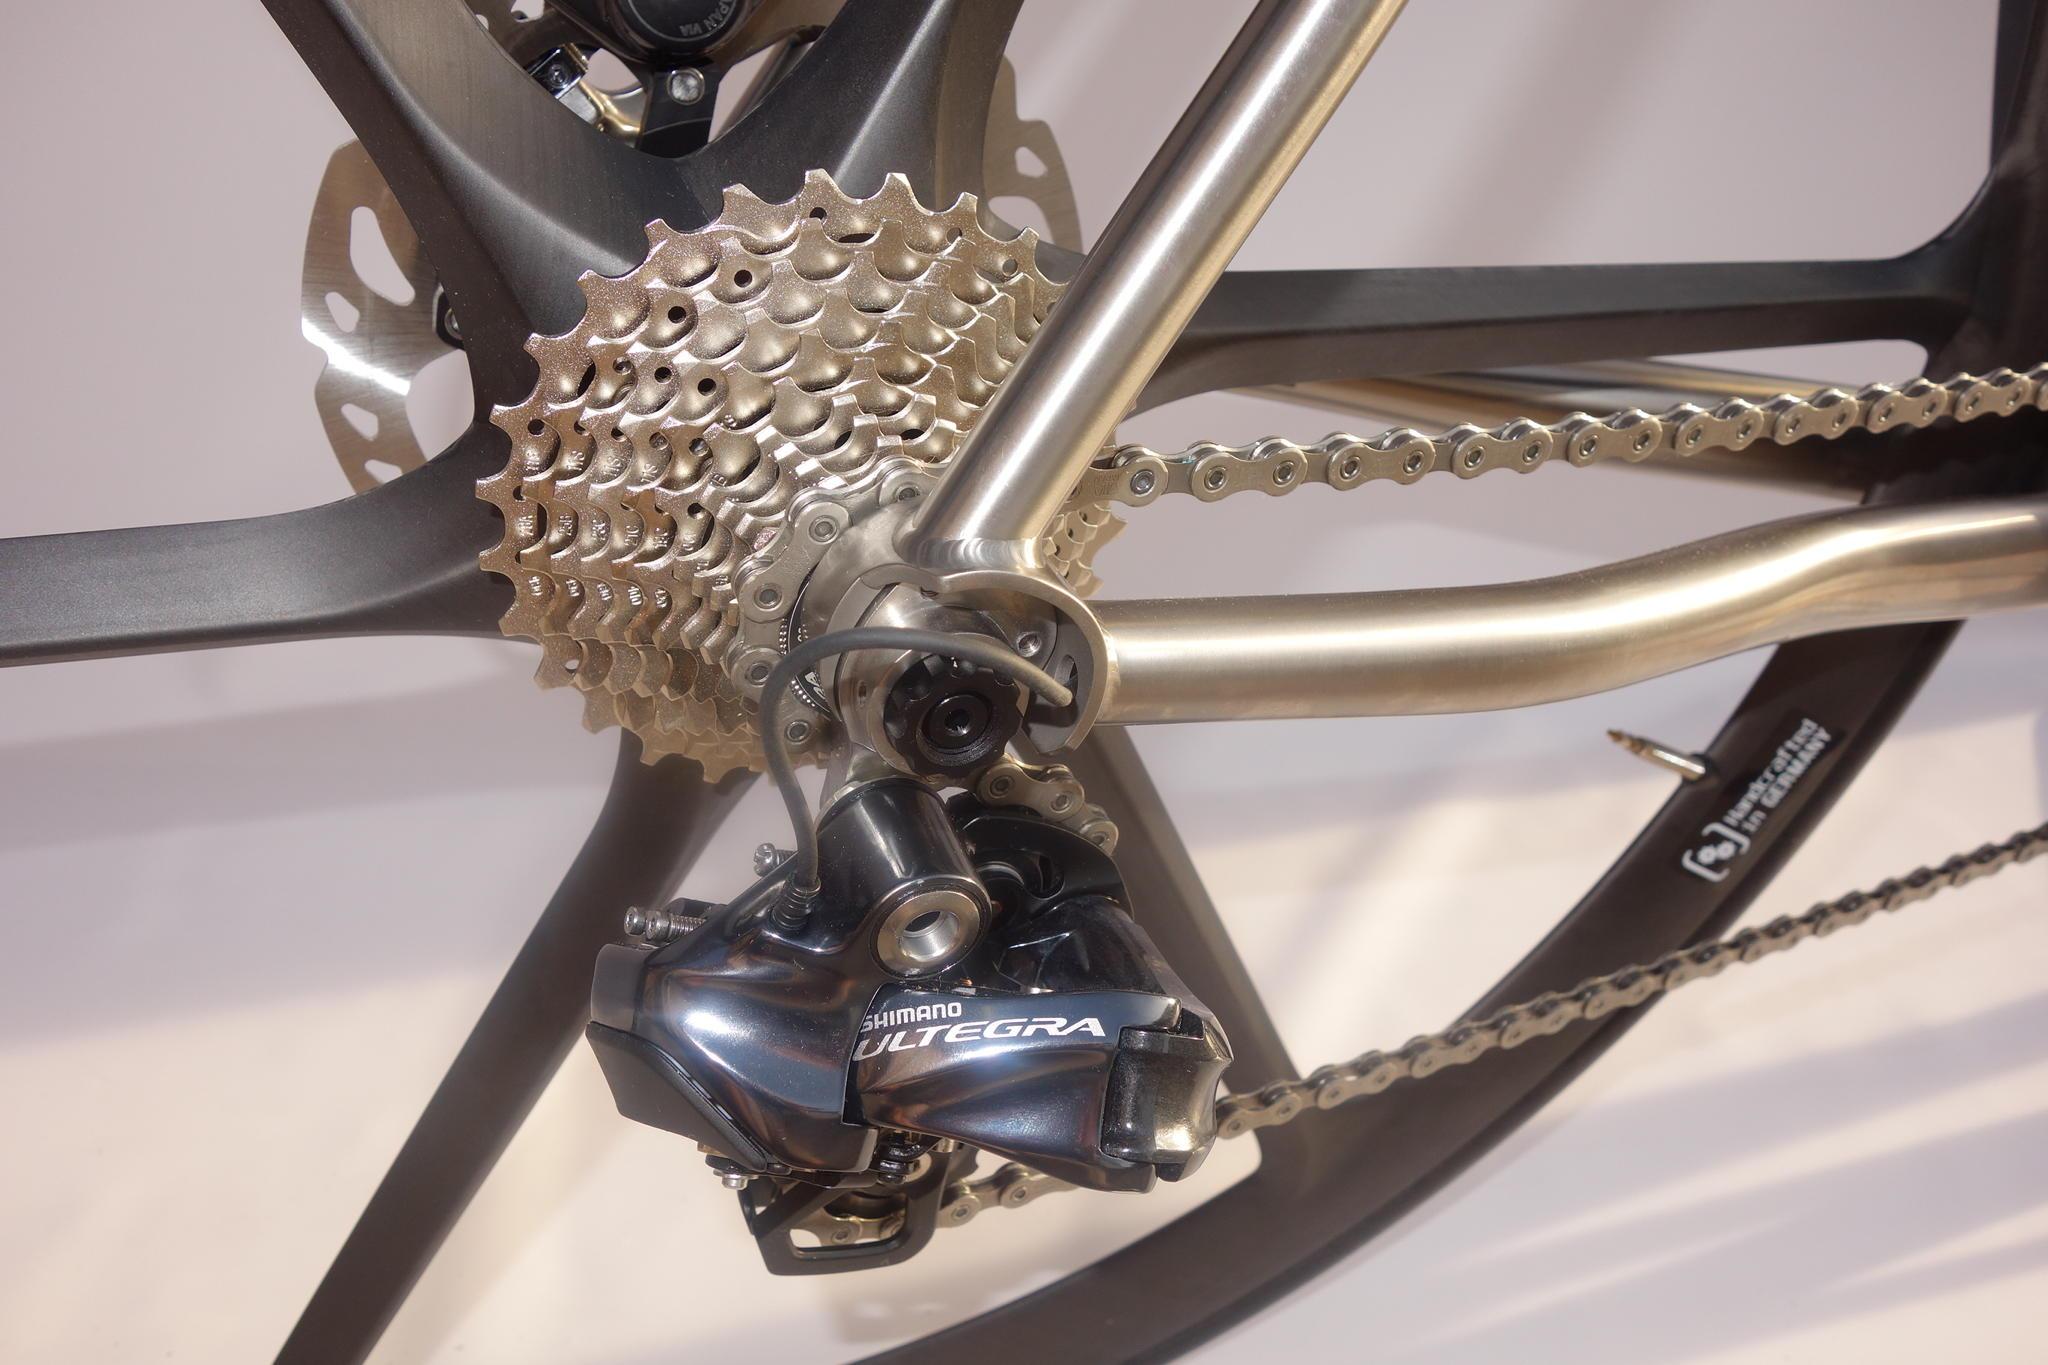 rabbit_cycles_titan_road_disc_dsc03319